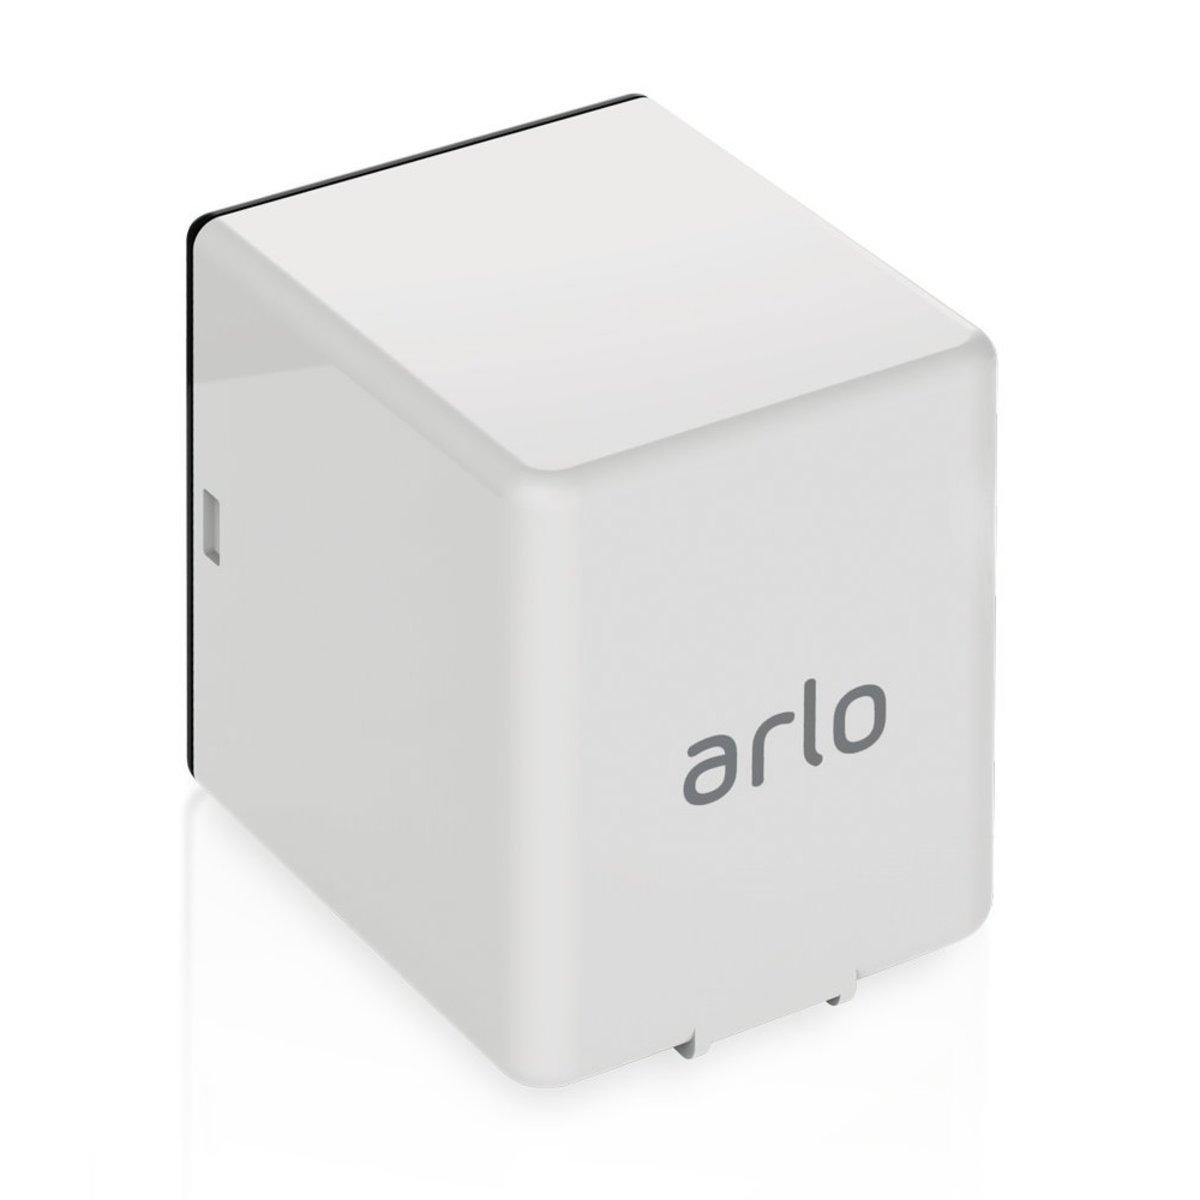 ARLO GO RECHARGEABLE BATTERY(VMA4410-1000S)